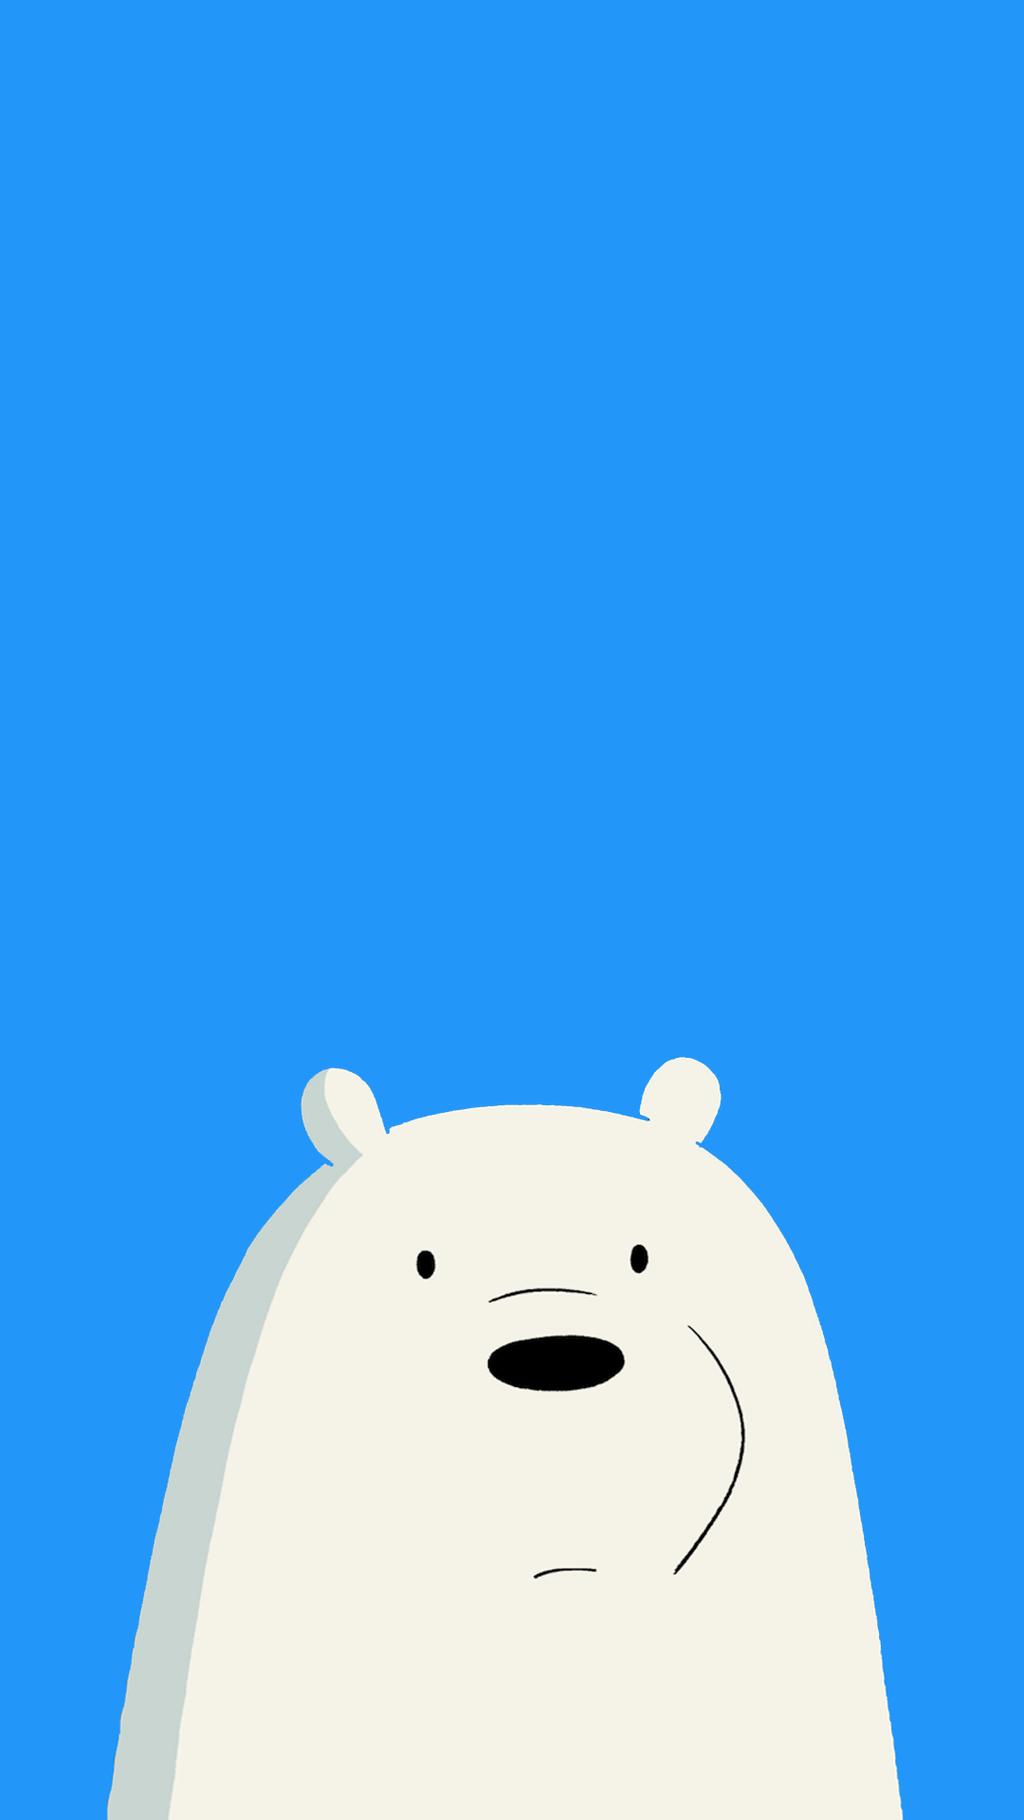 We Bare Bears  IceBear mobile wallpaper 1080x1920 by Affentoast on DeviantArt